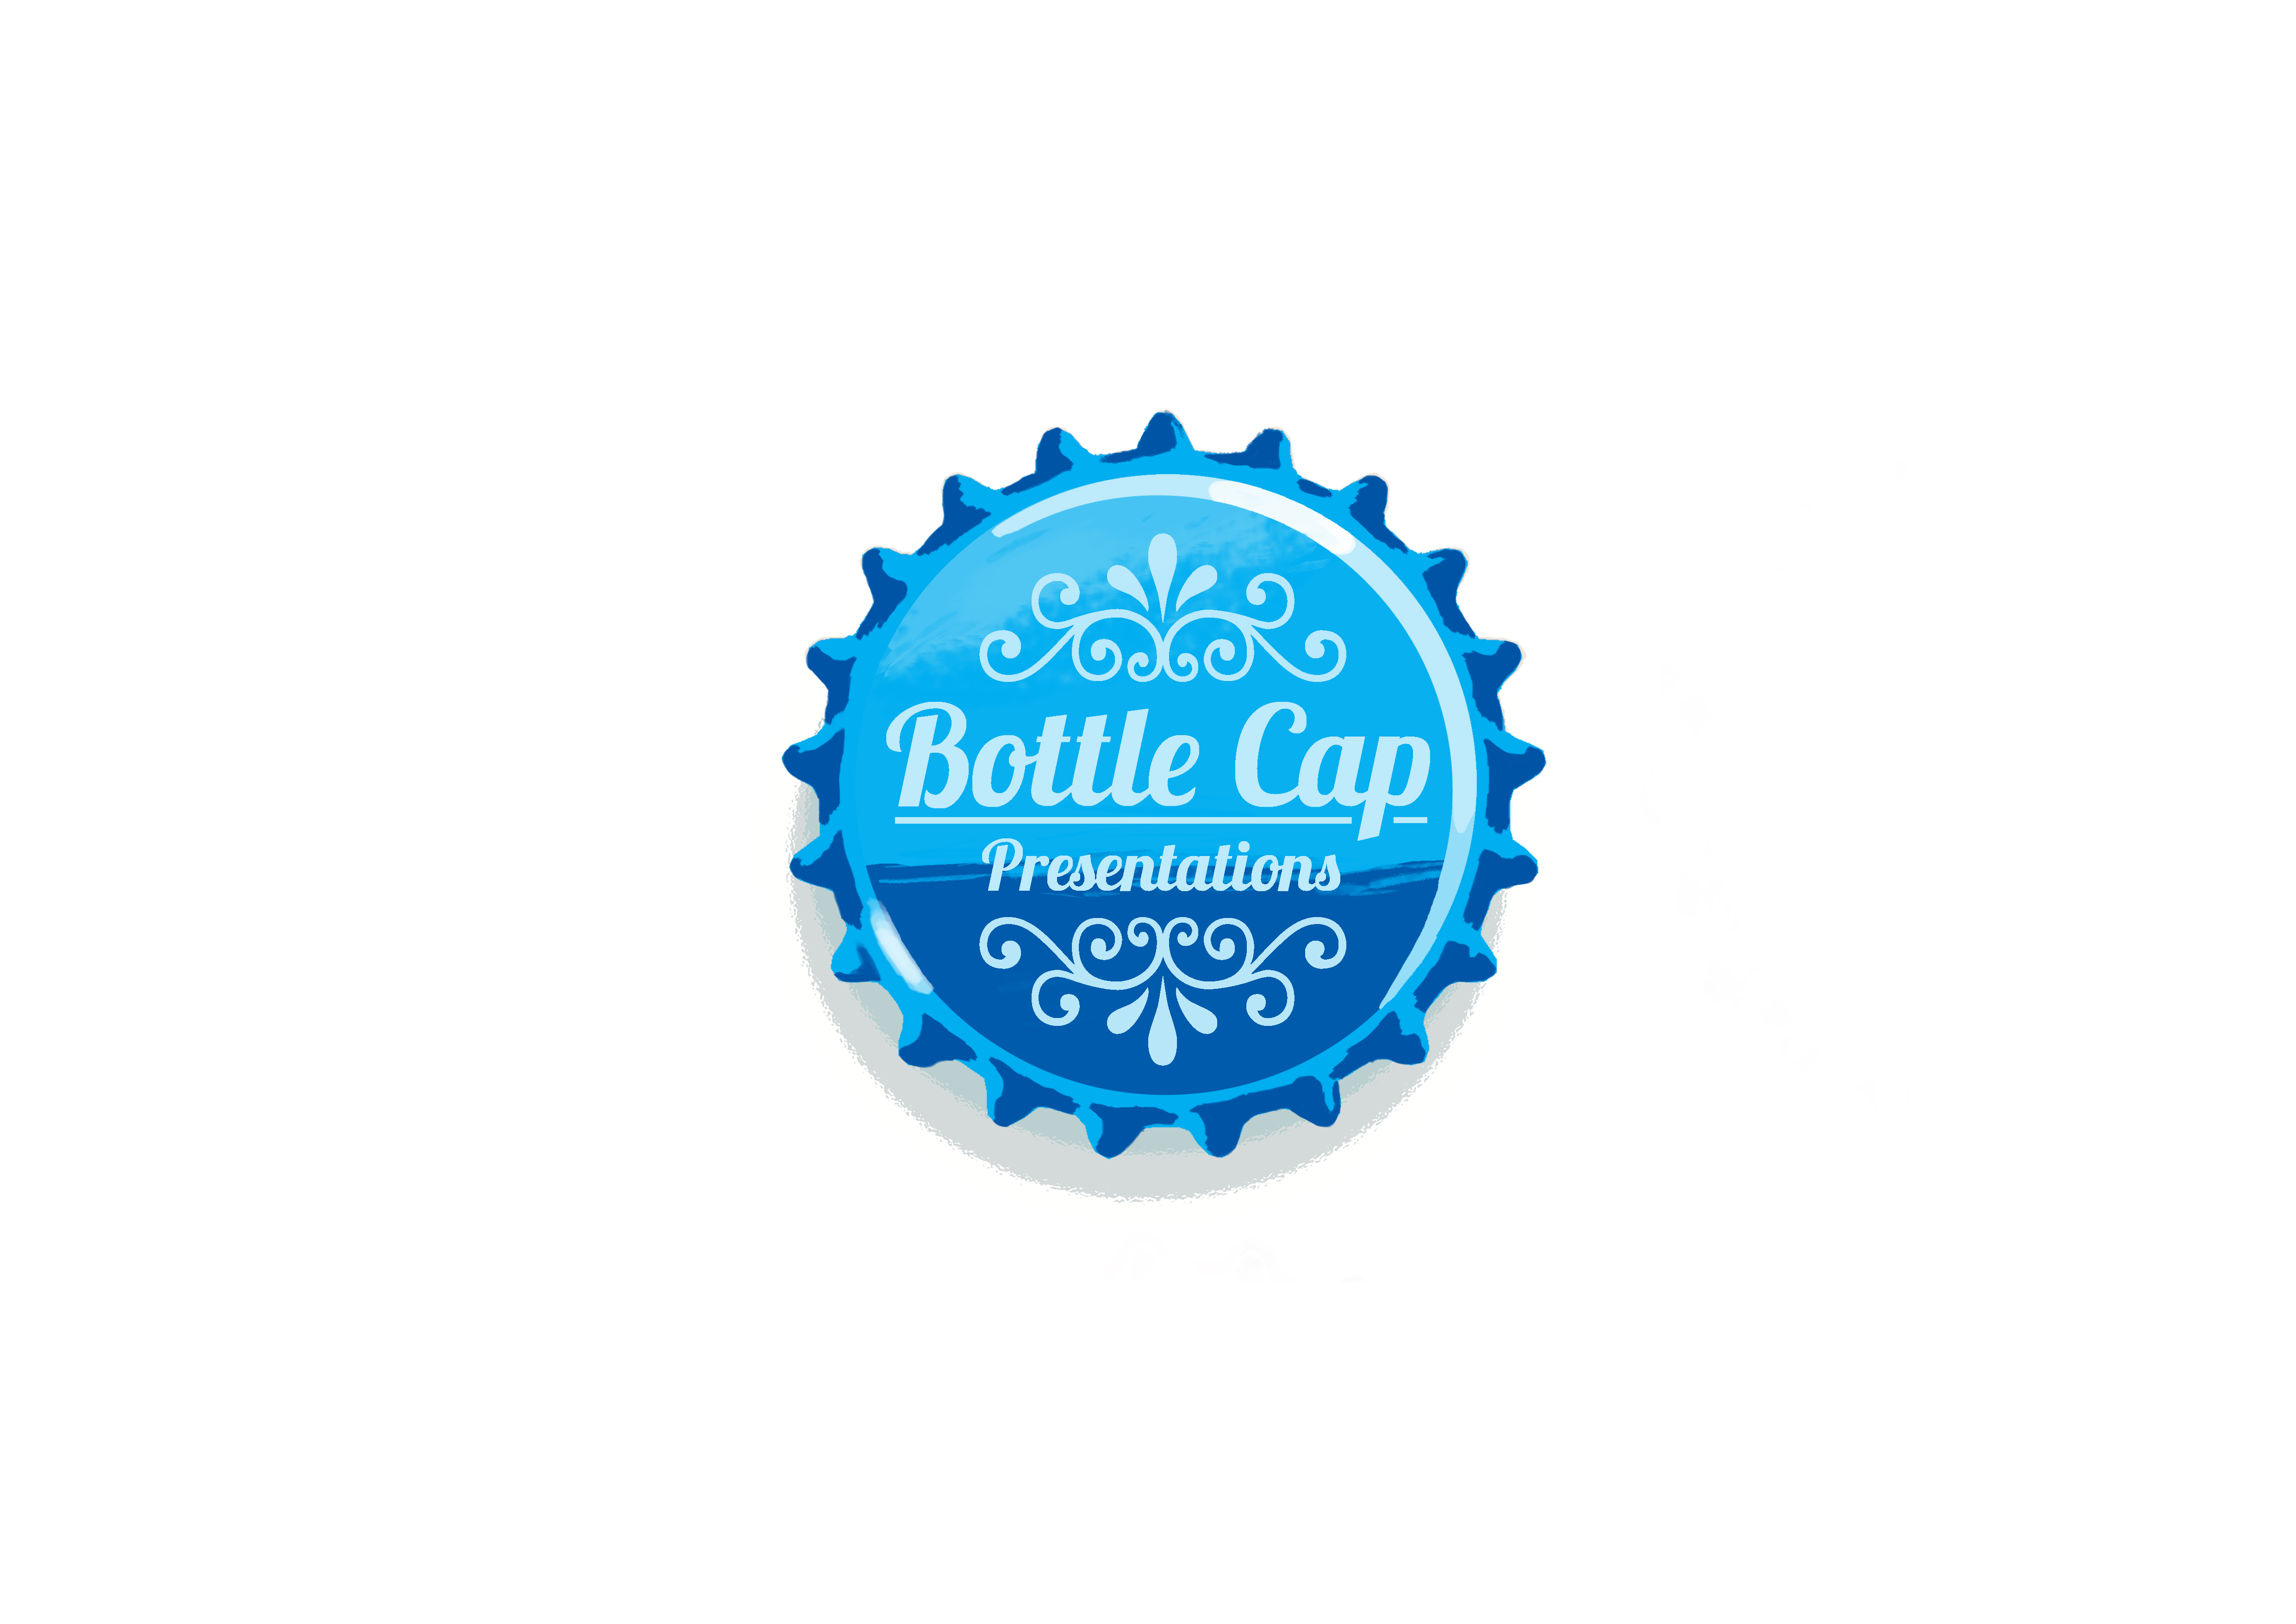 Dean needham artist designer animator and all round for Bottle cap designs